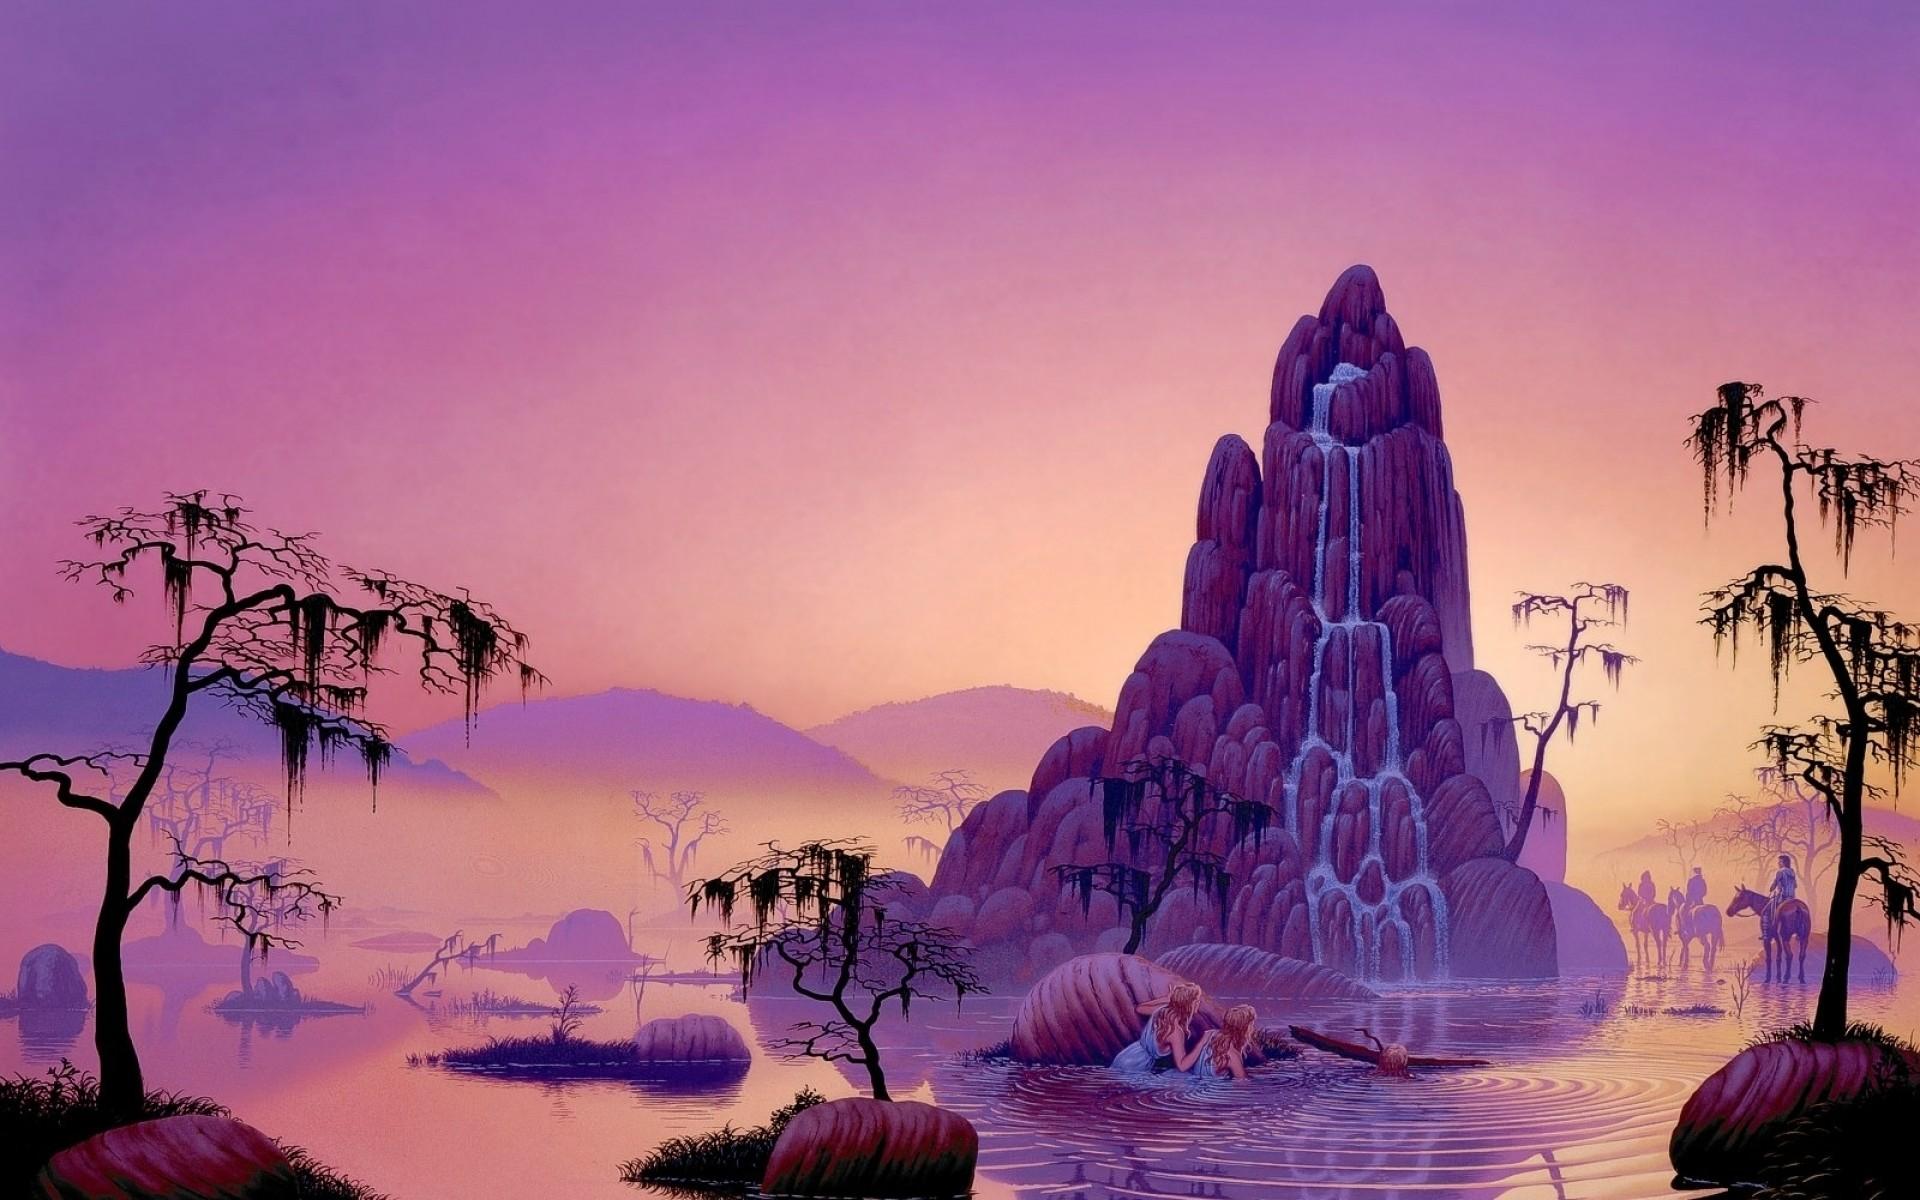 Mermaid background ·① Download free stunning full HD ...